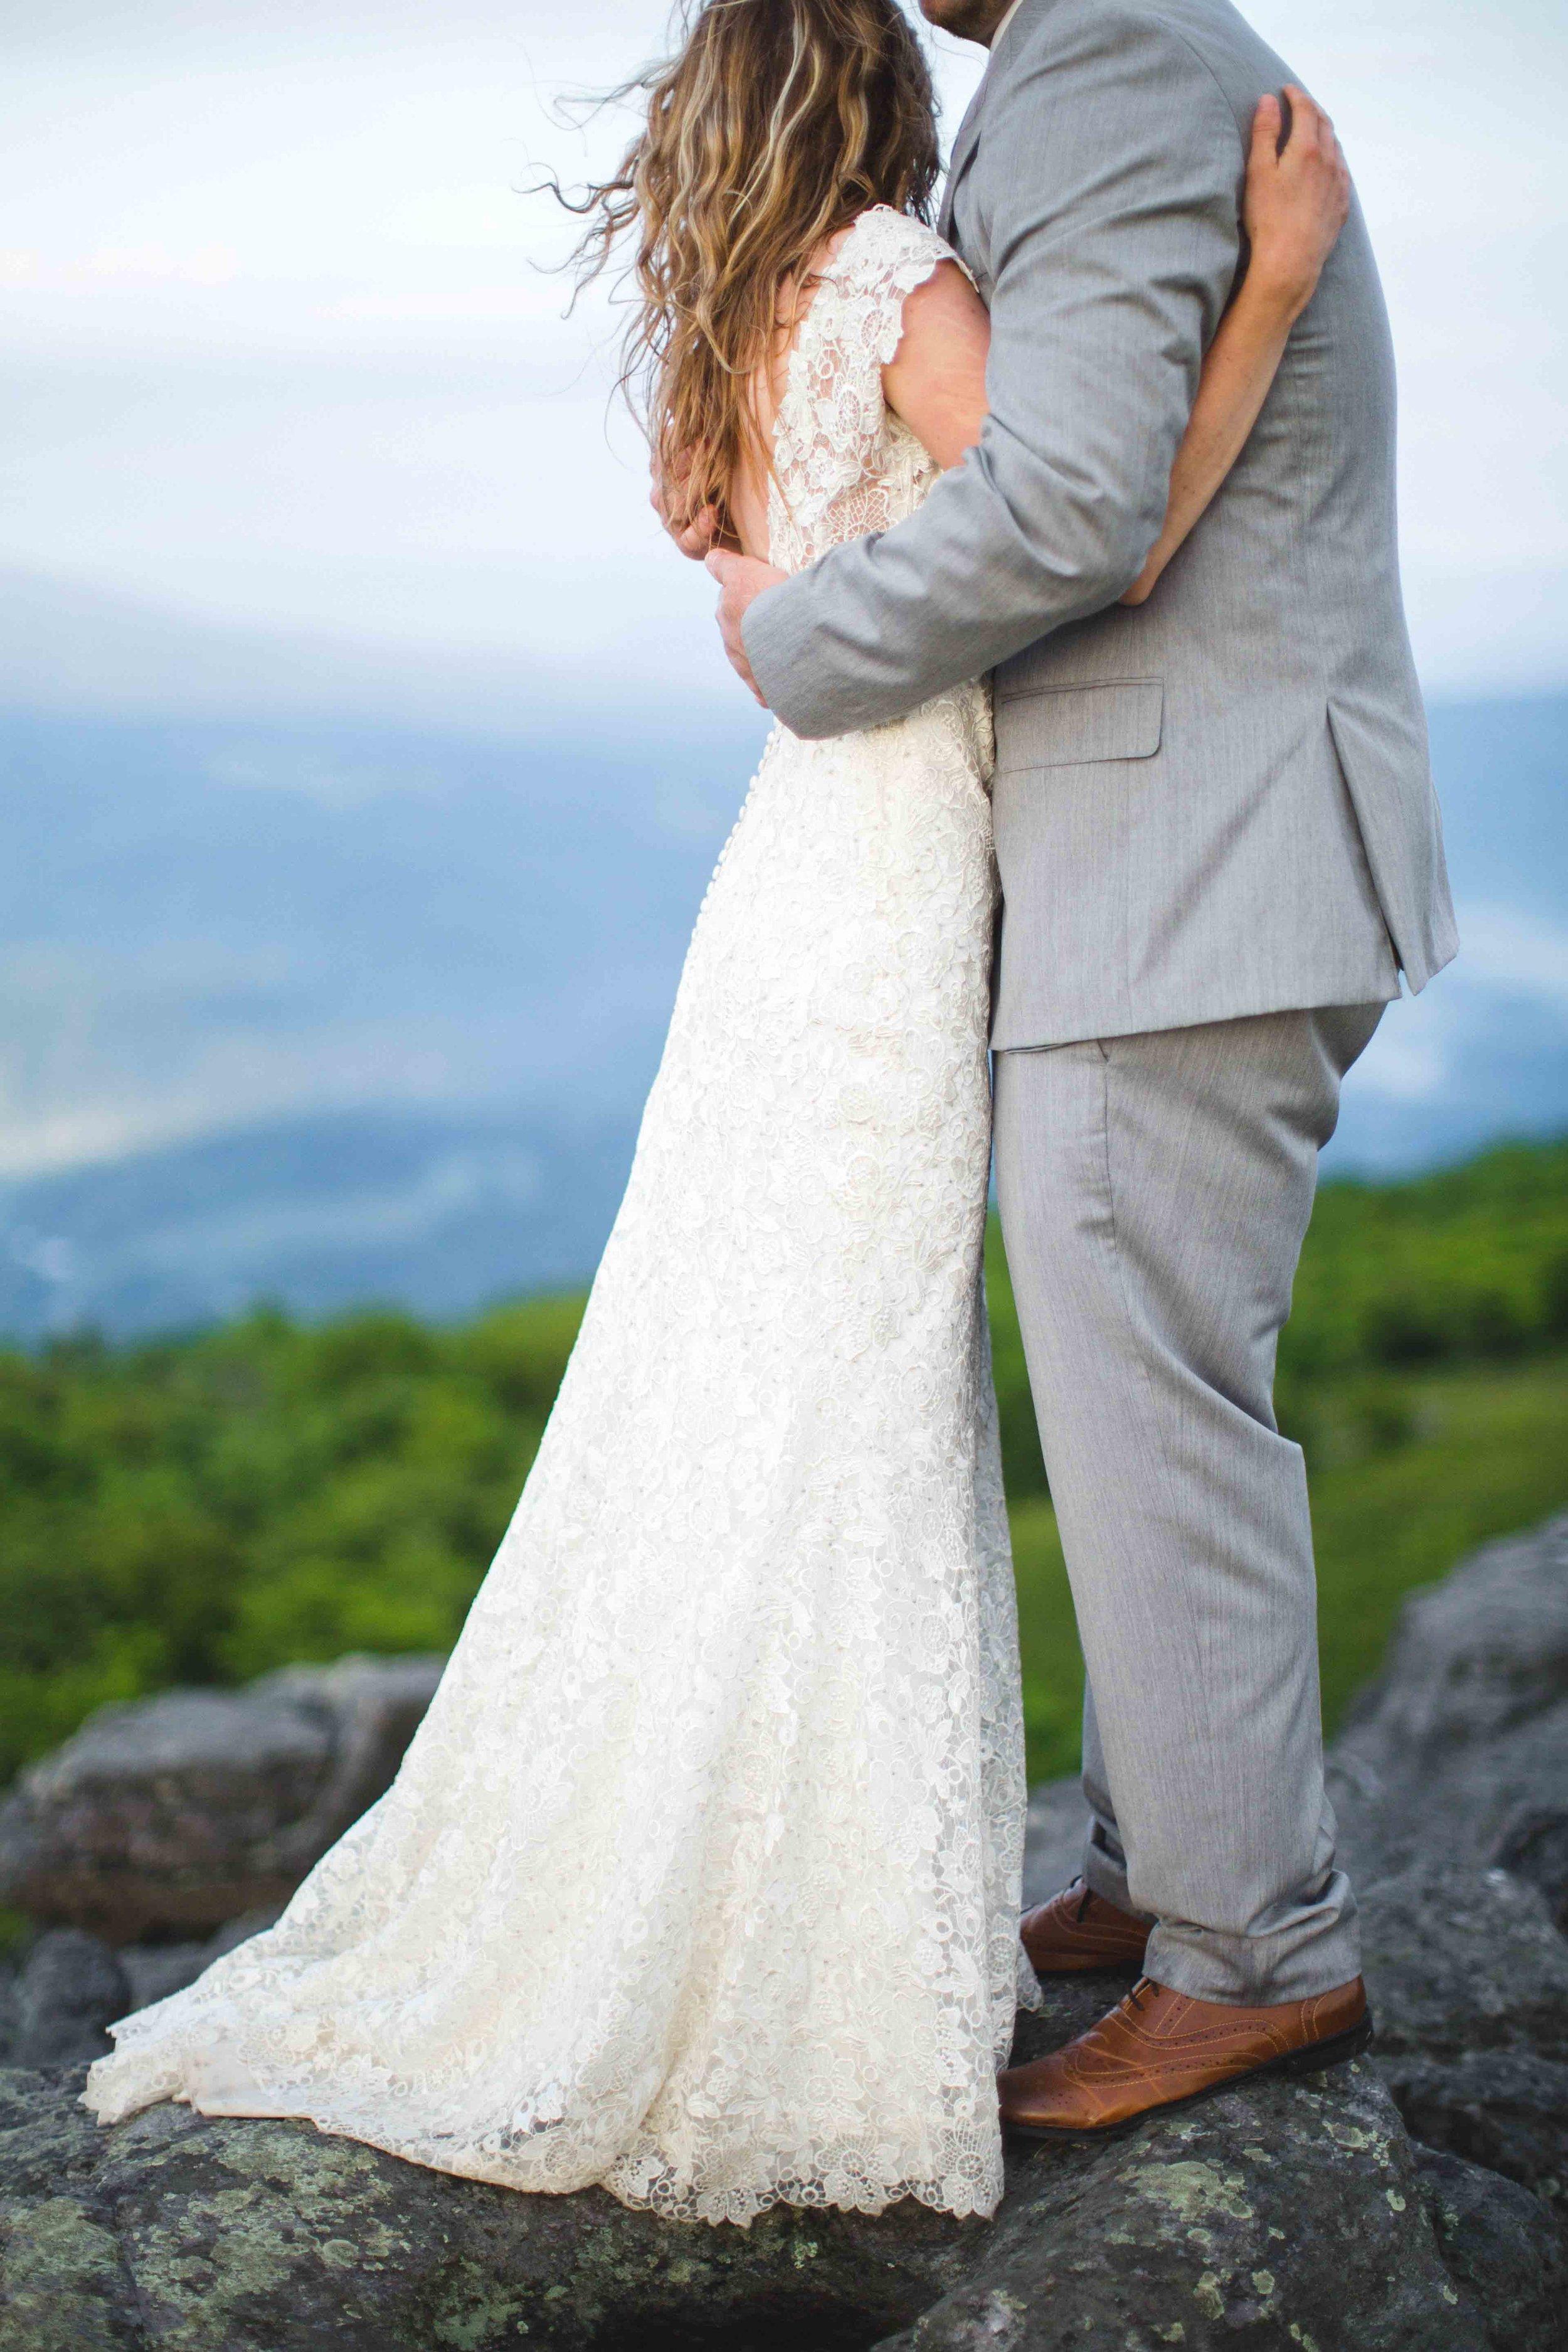 north-carolina-elopement-photographer-81.jpg